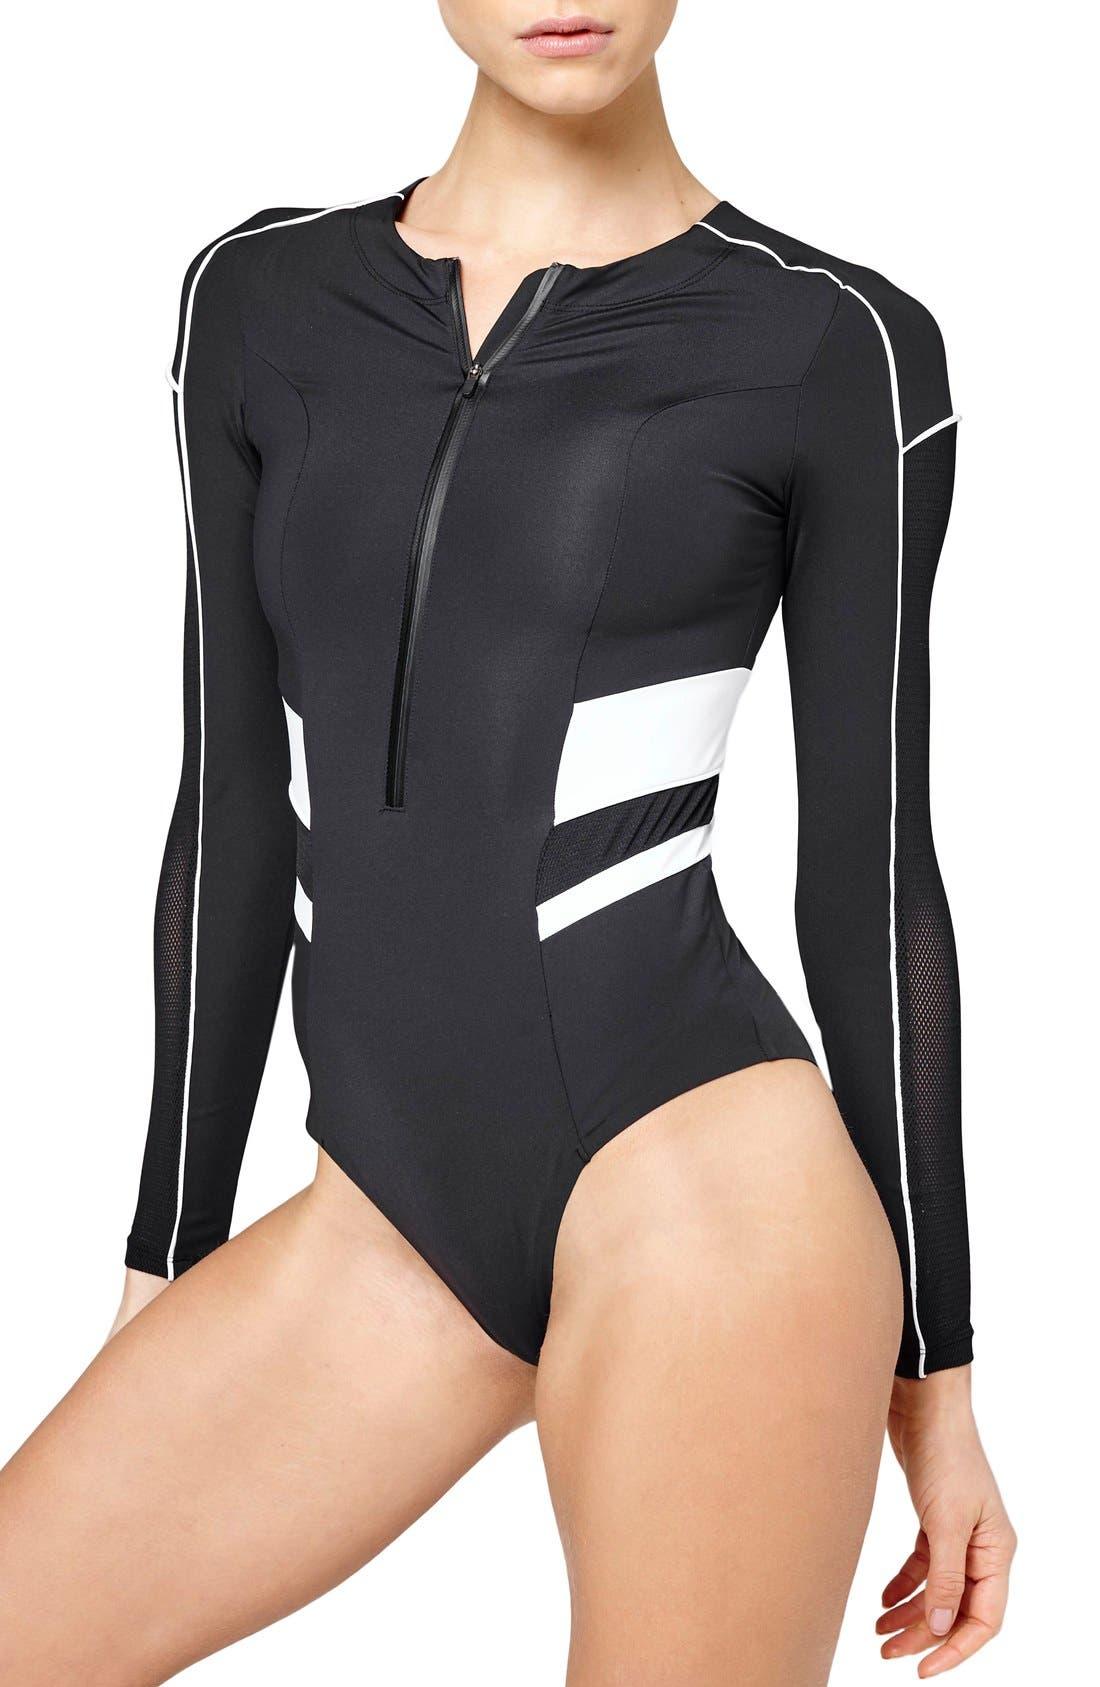 Alternate Image 1 Selected - IVY PARK® Biker Colorblock Bodysuit